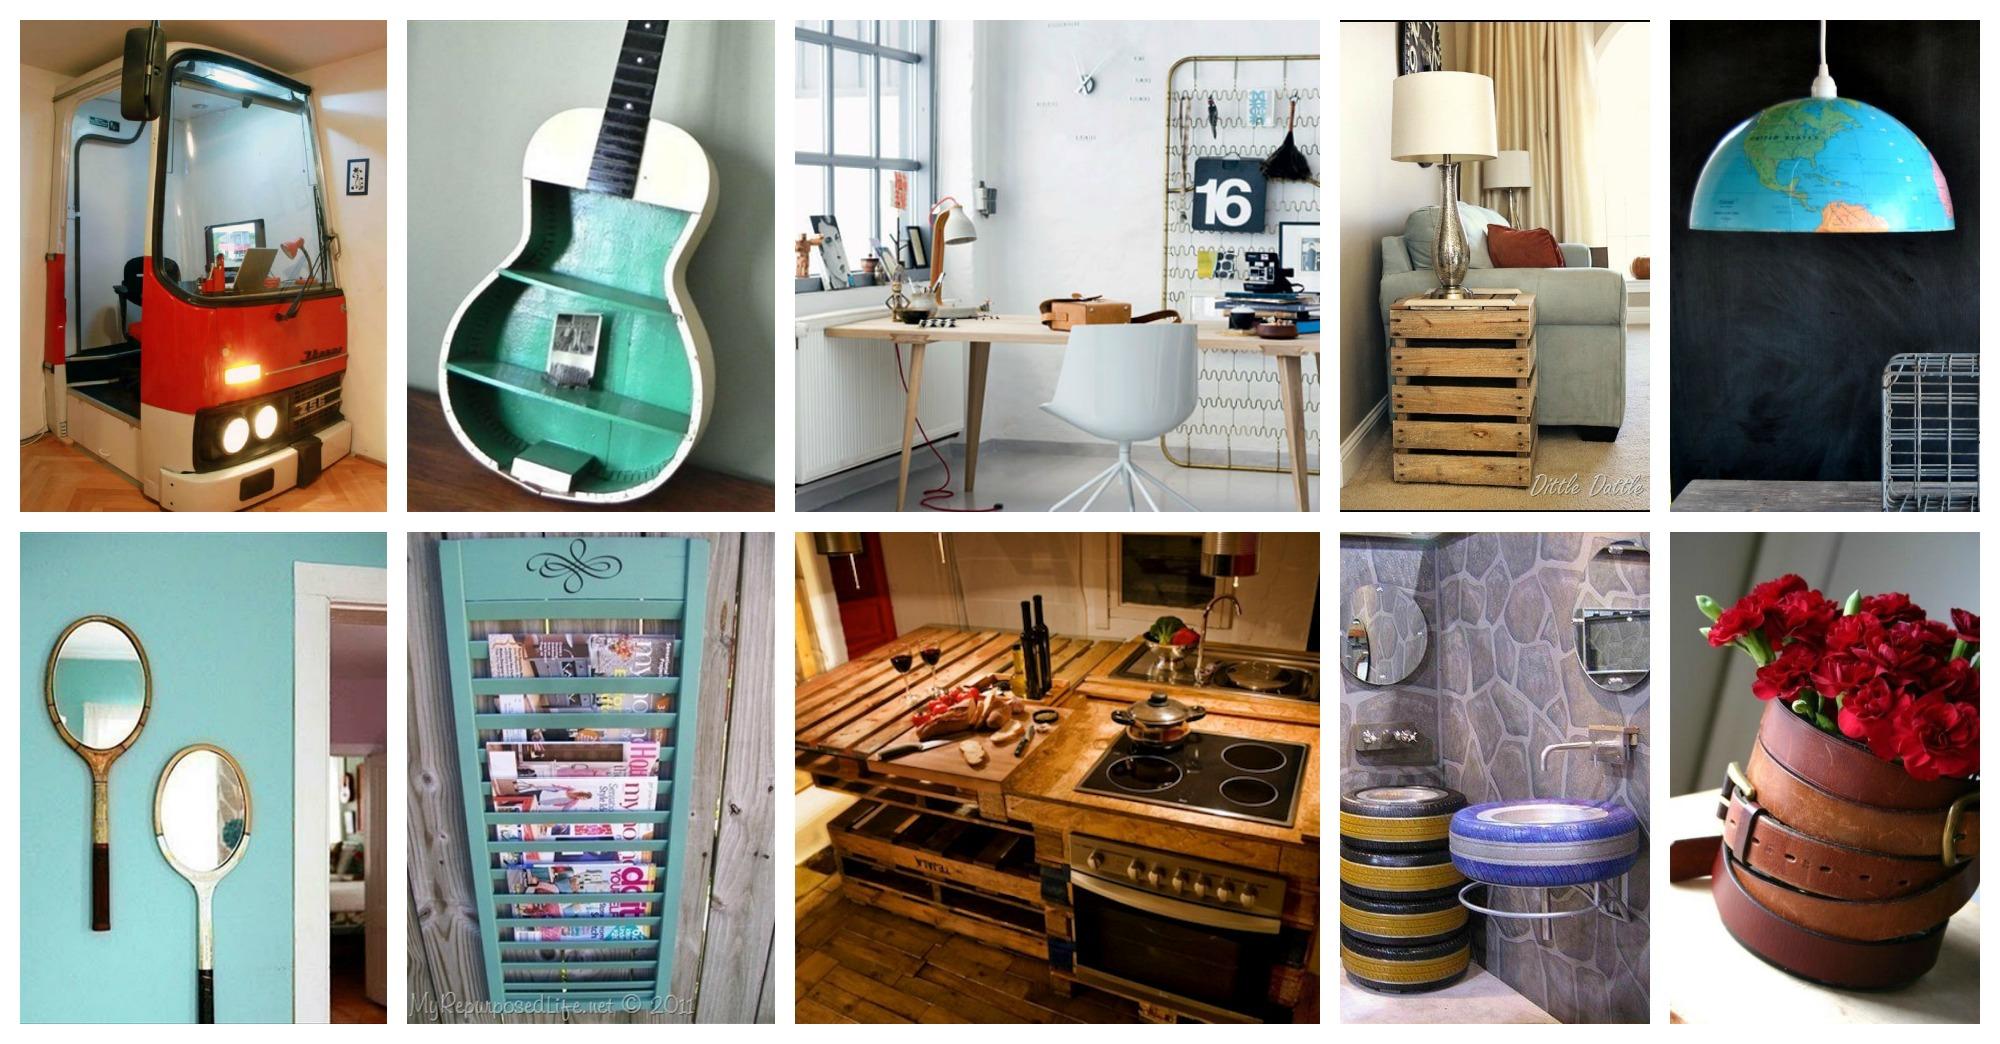 How To Repurpose Old Items In Interior Decor